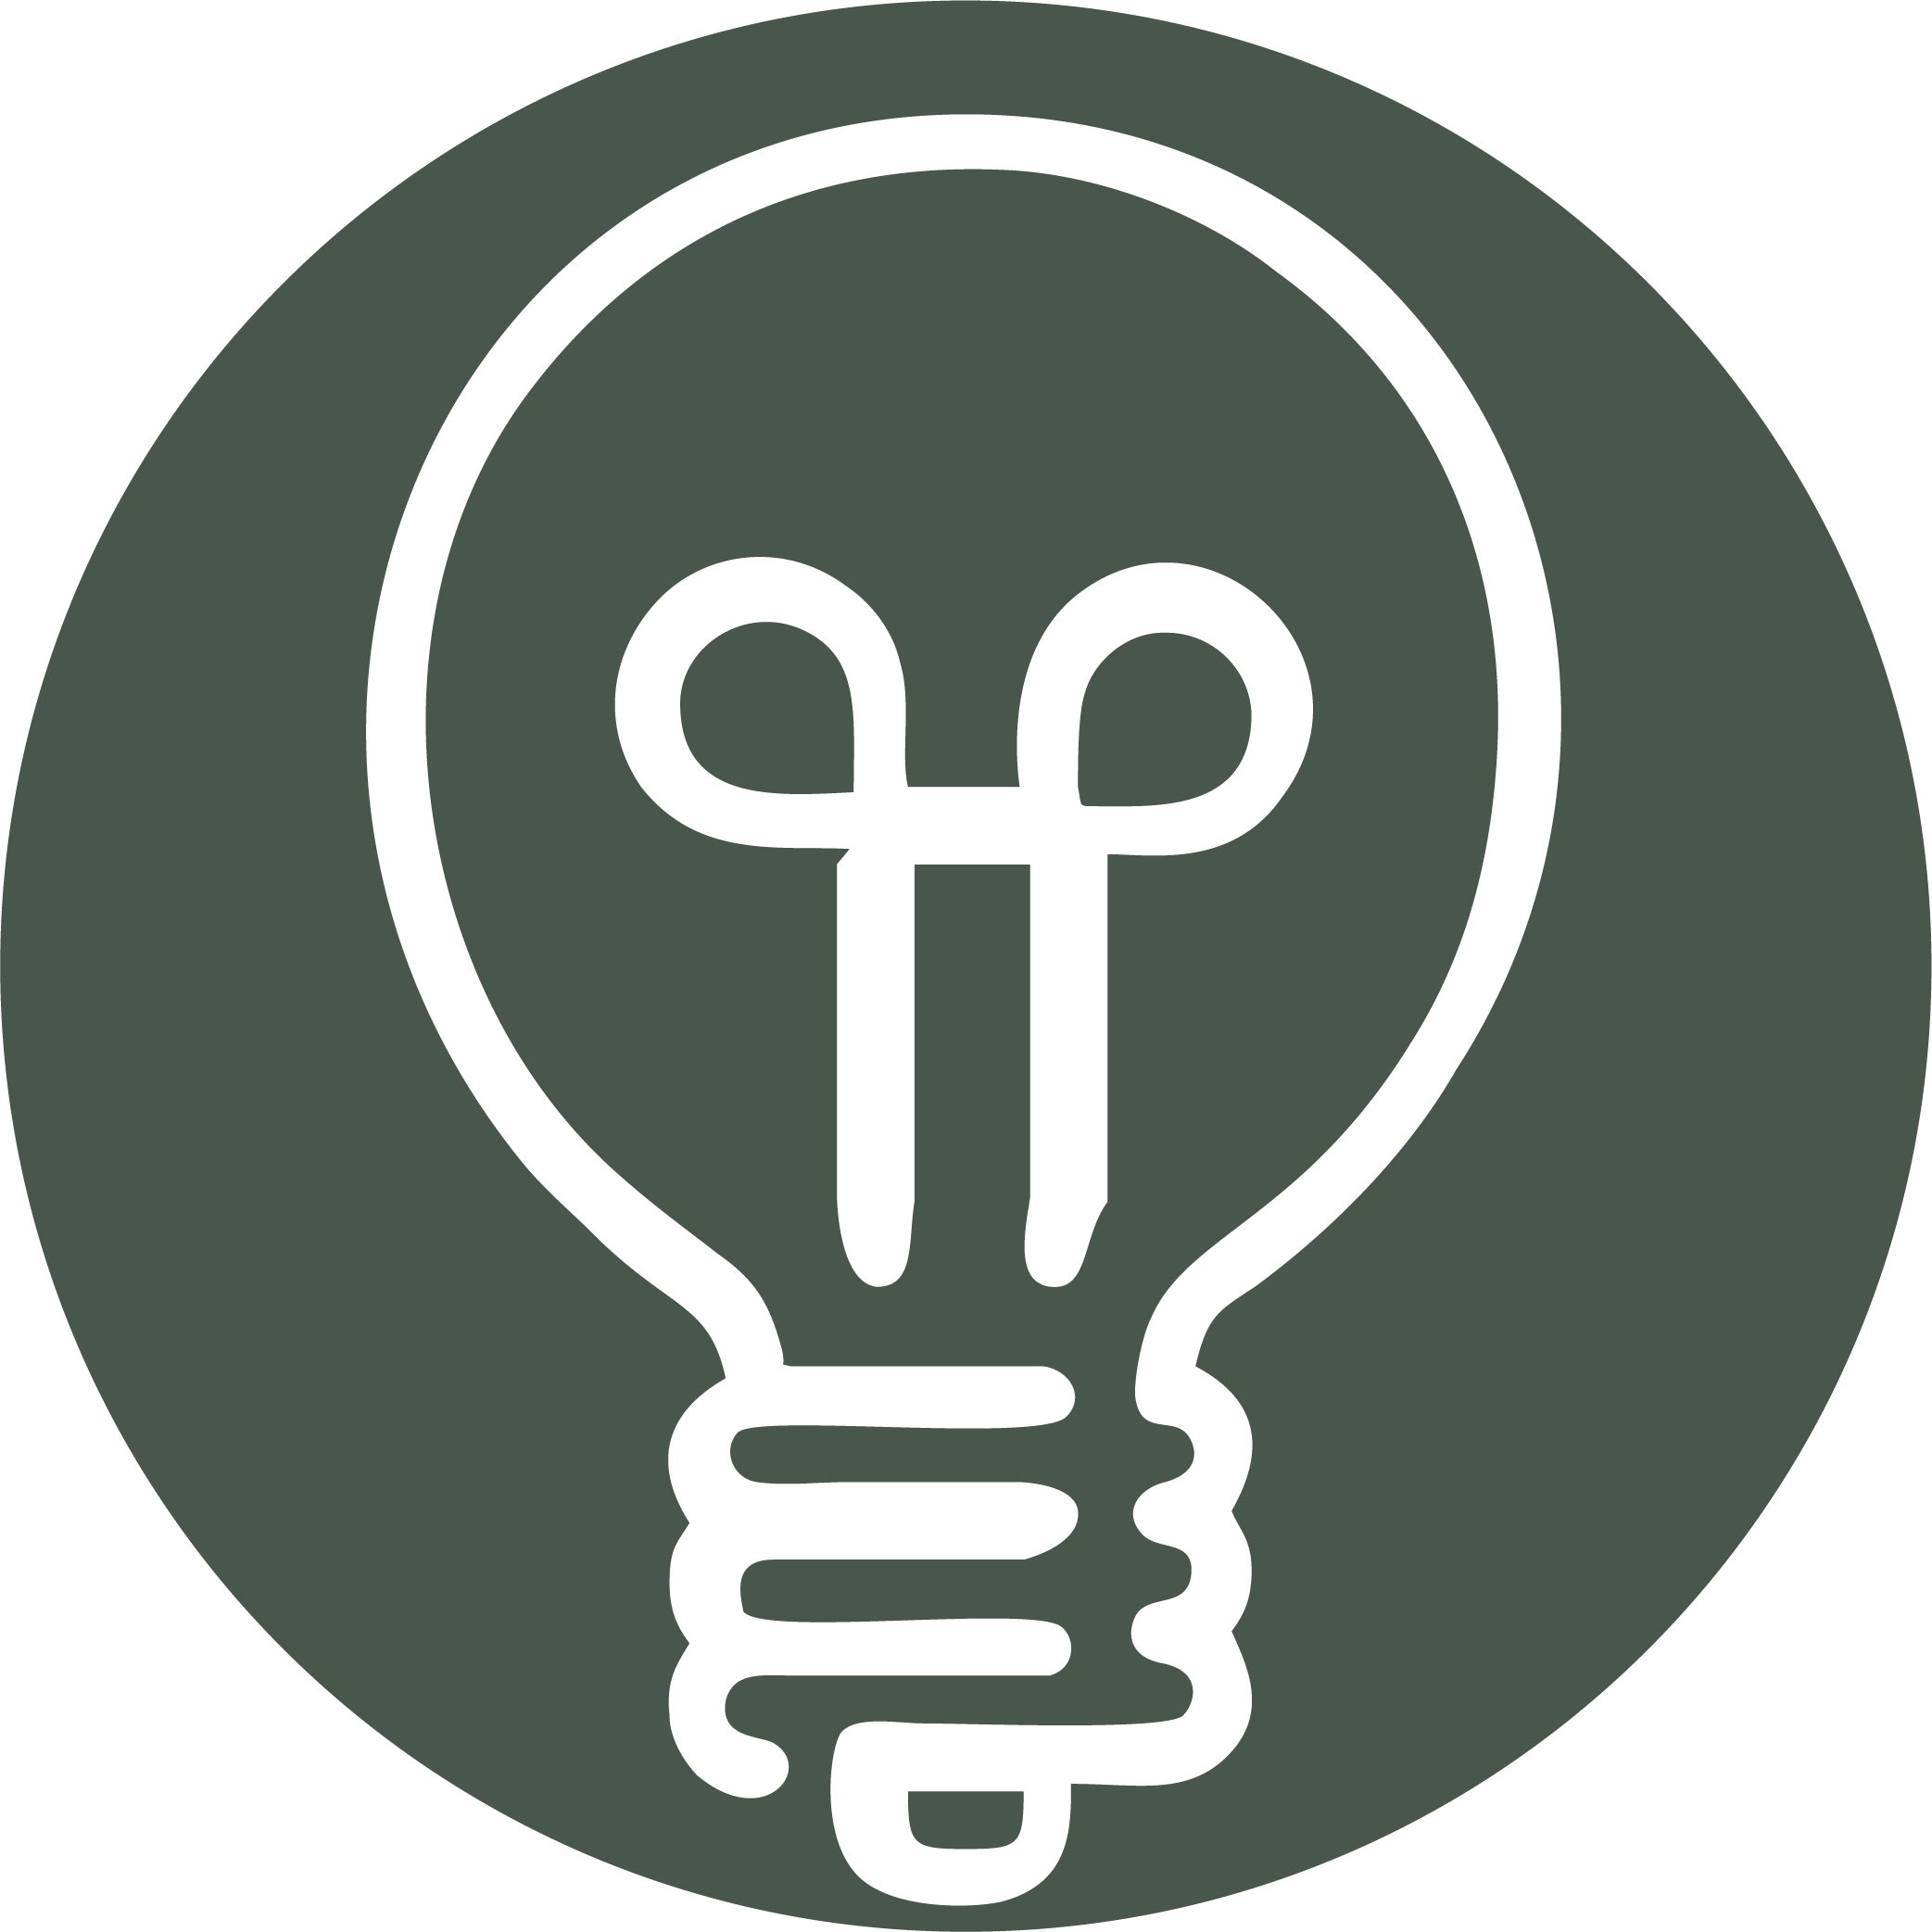 Werkterrein-kwartiermakers-icon-home-pagina-makers-concepts-1